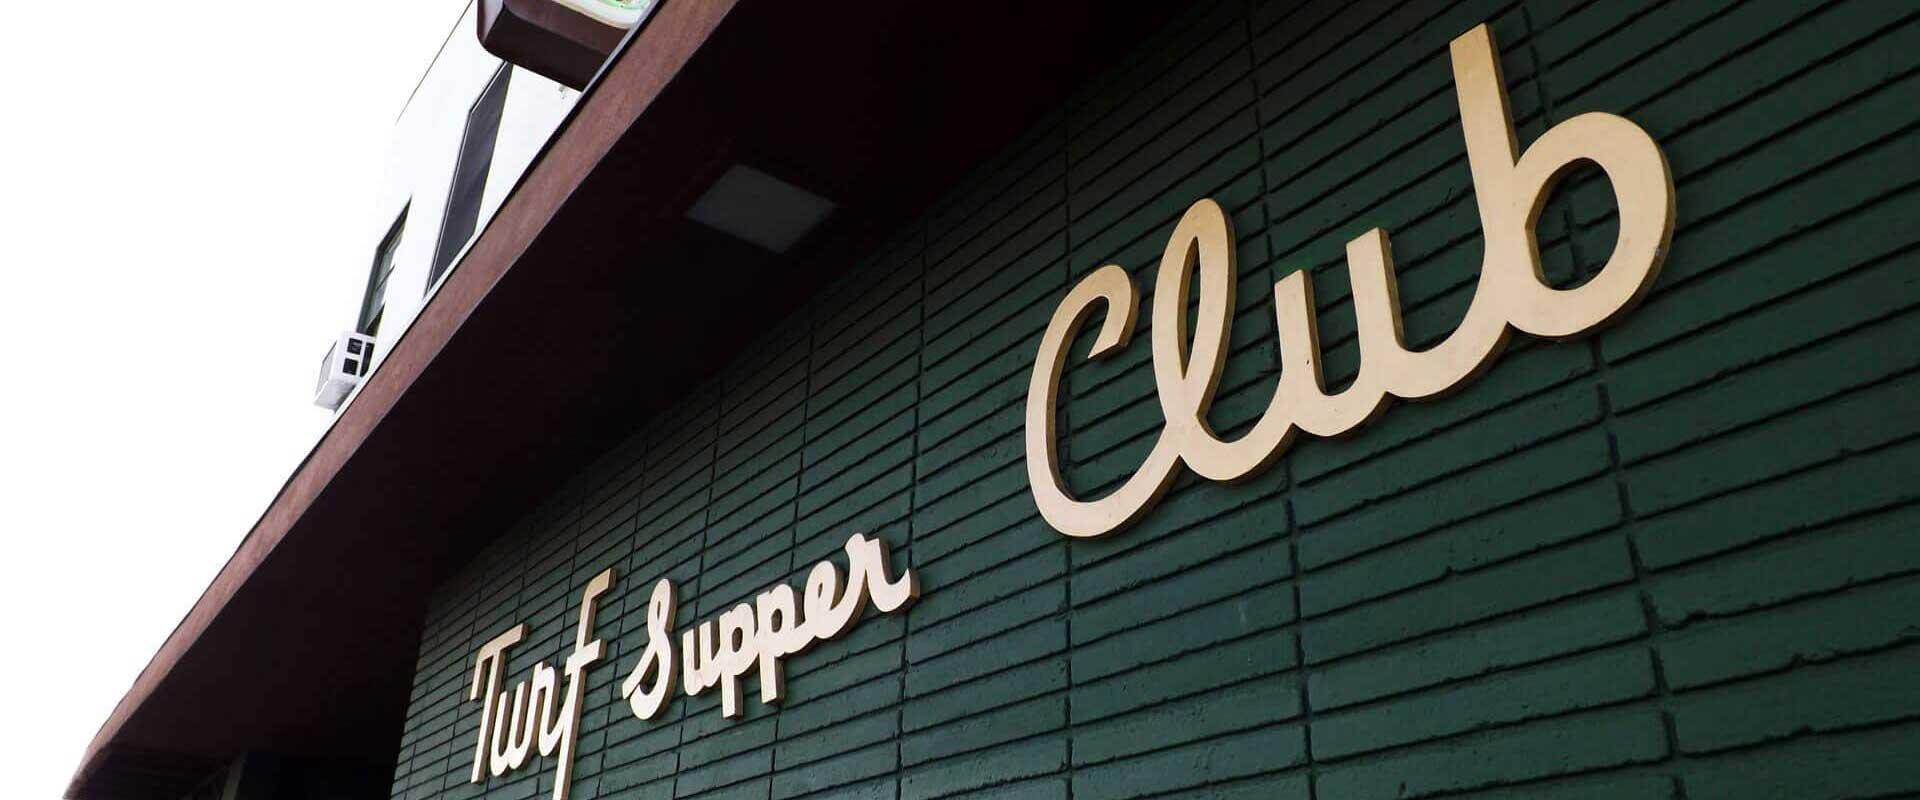 Turf Supper Club outside wall